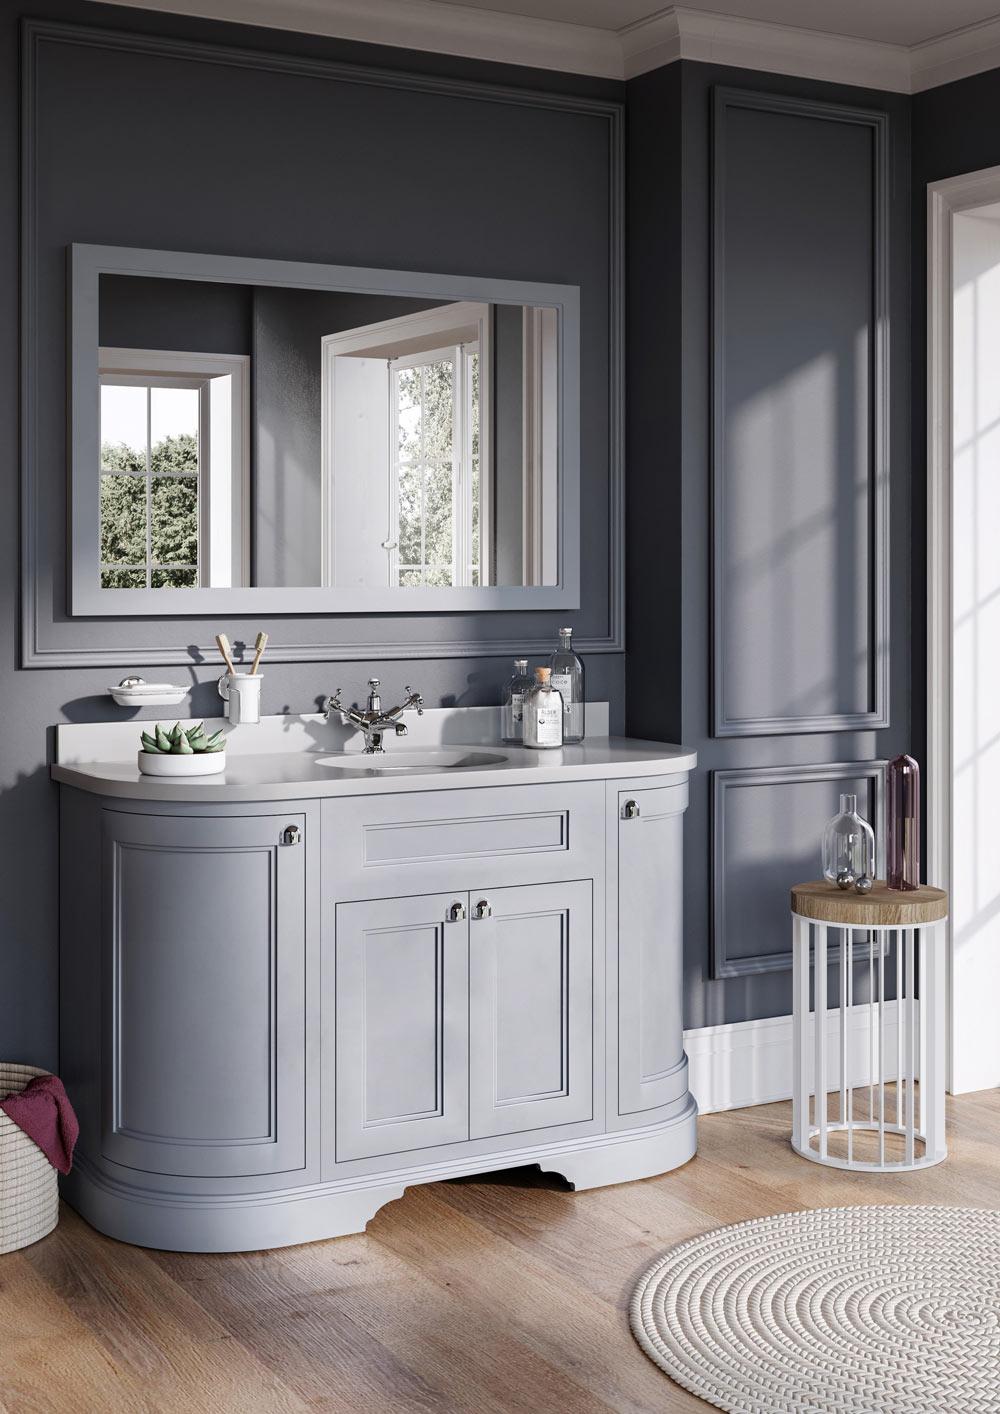 1340 Curved Vanity Unit Btw Baths Tiles Woodfloors